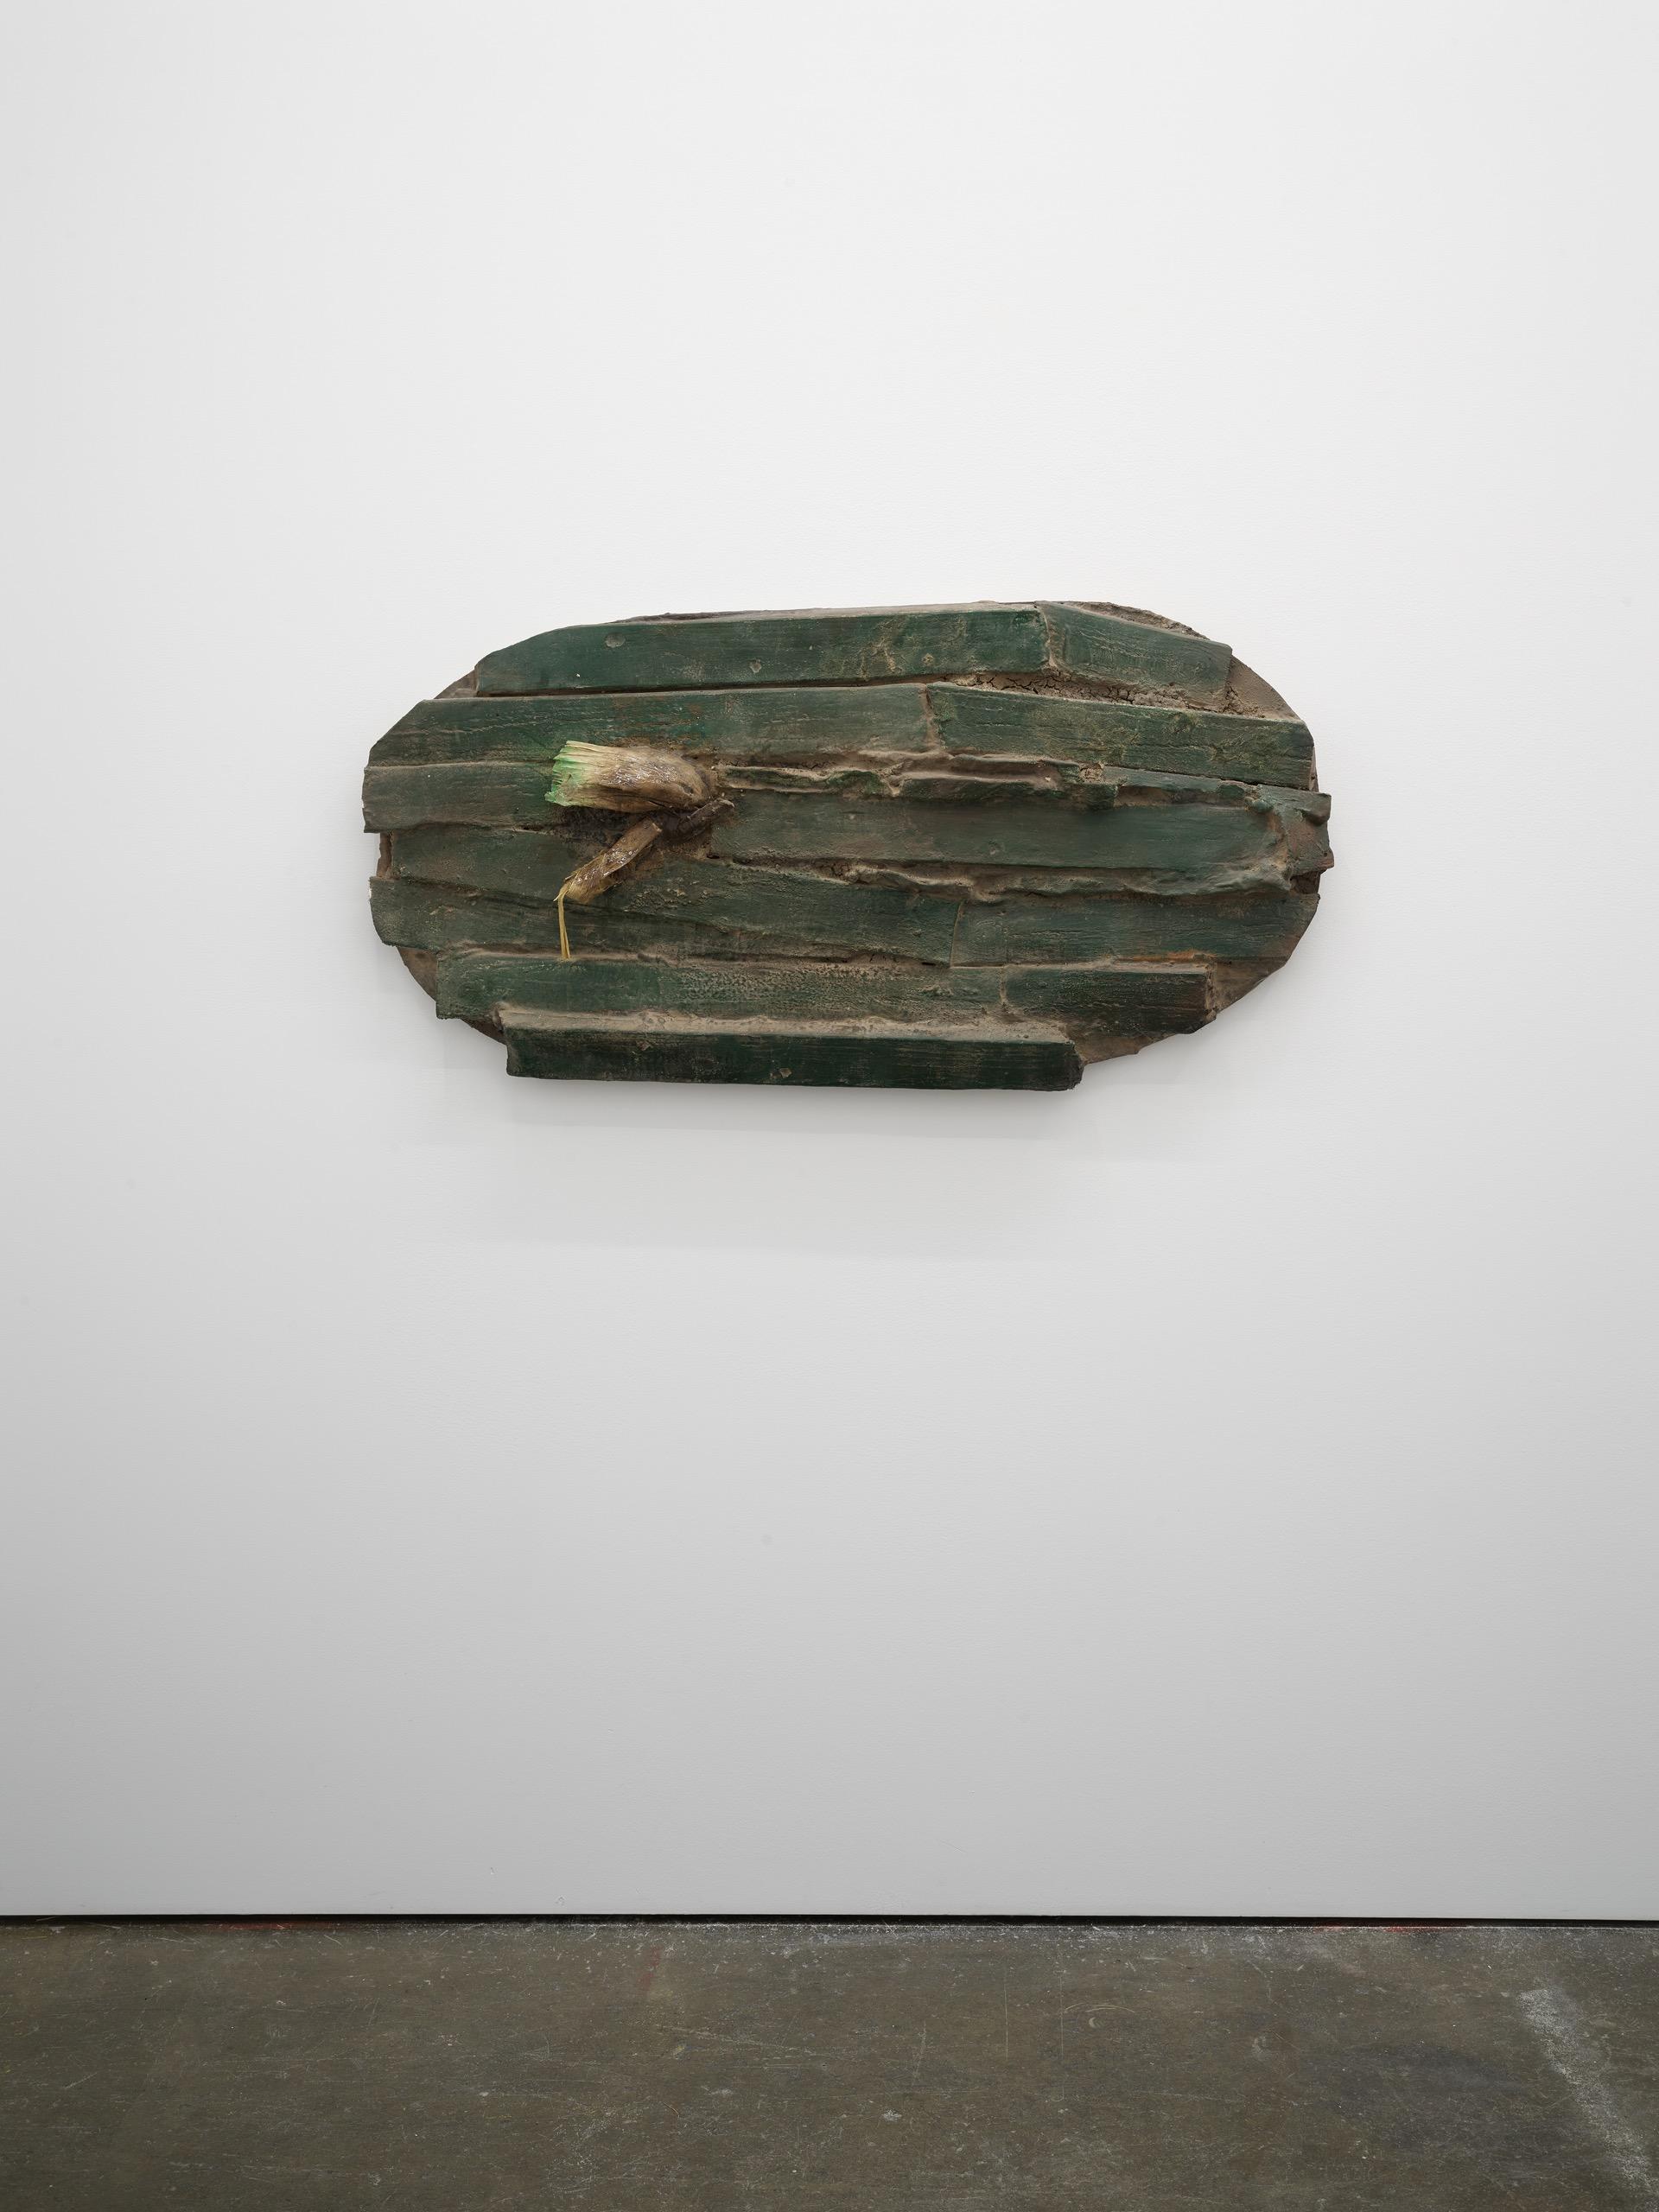 Brandon Ndife, Nantucket , 2021, Cast Aqua resin, earth pigment, enamel, wood, rubber